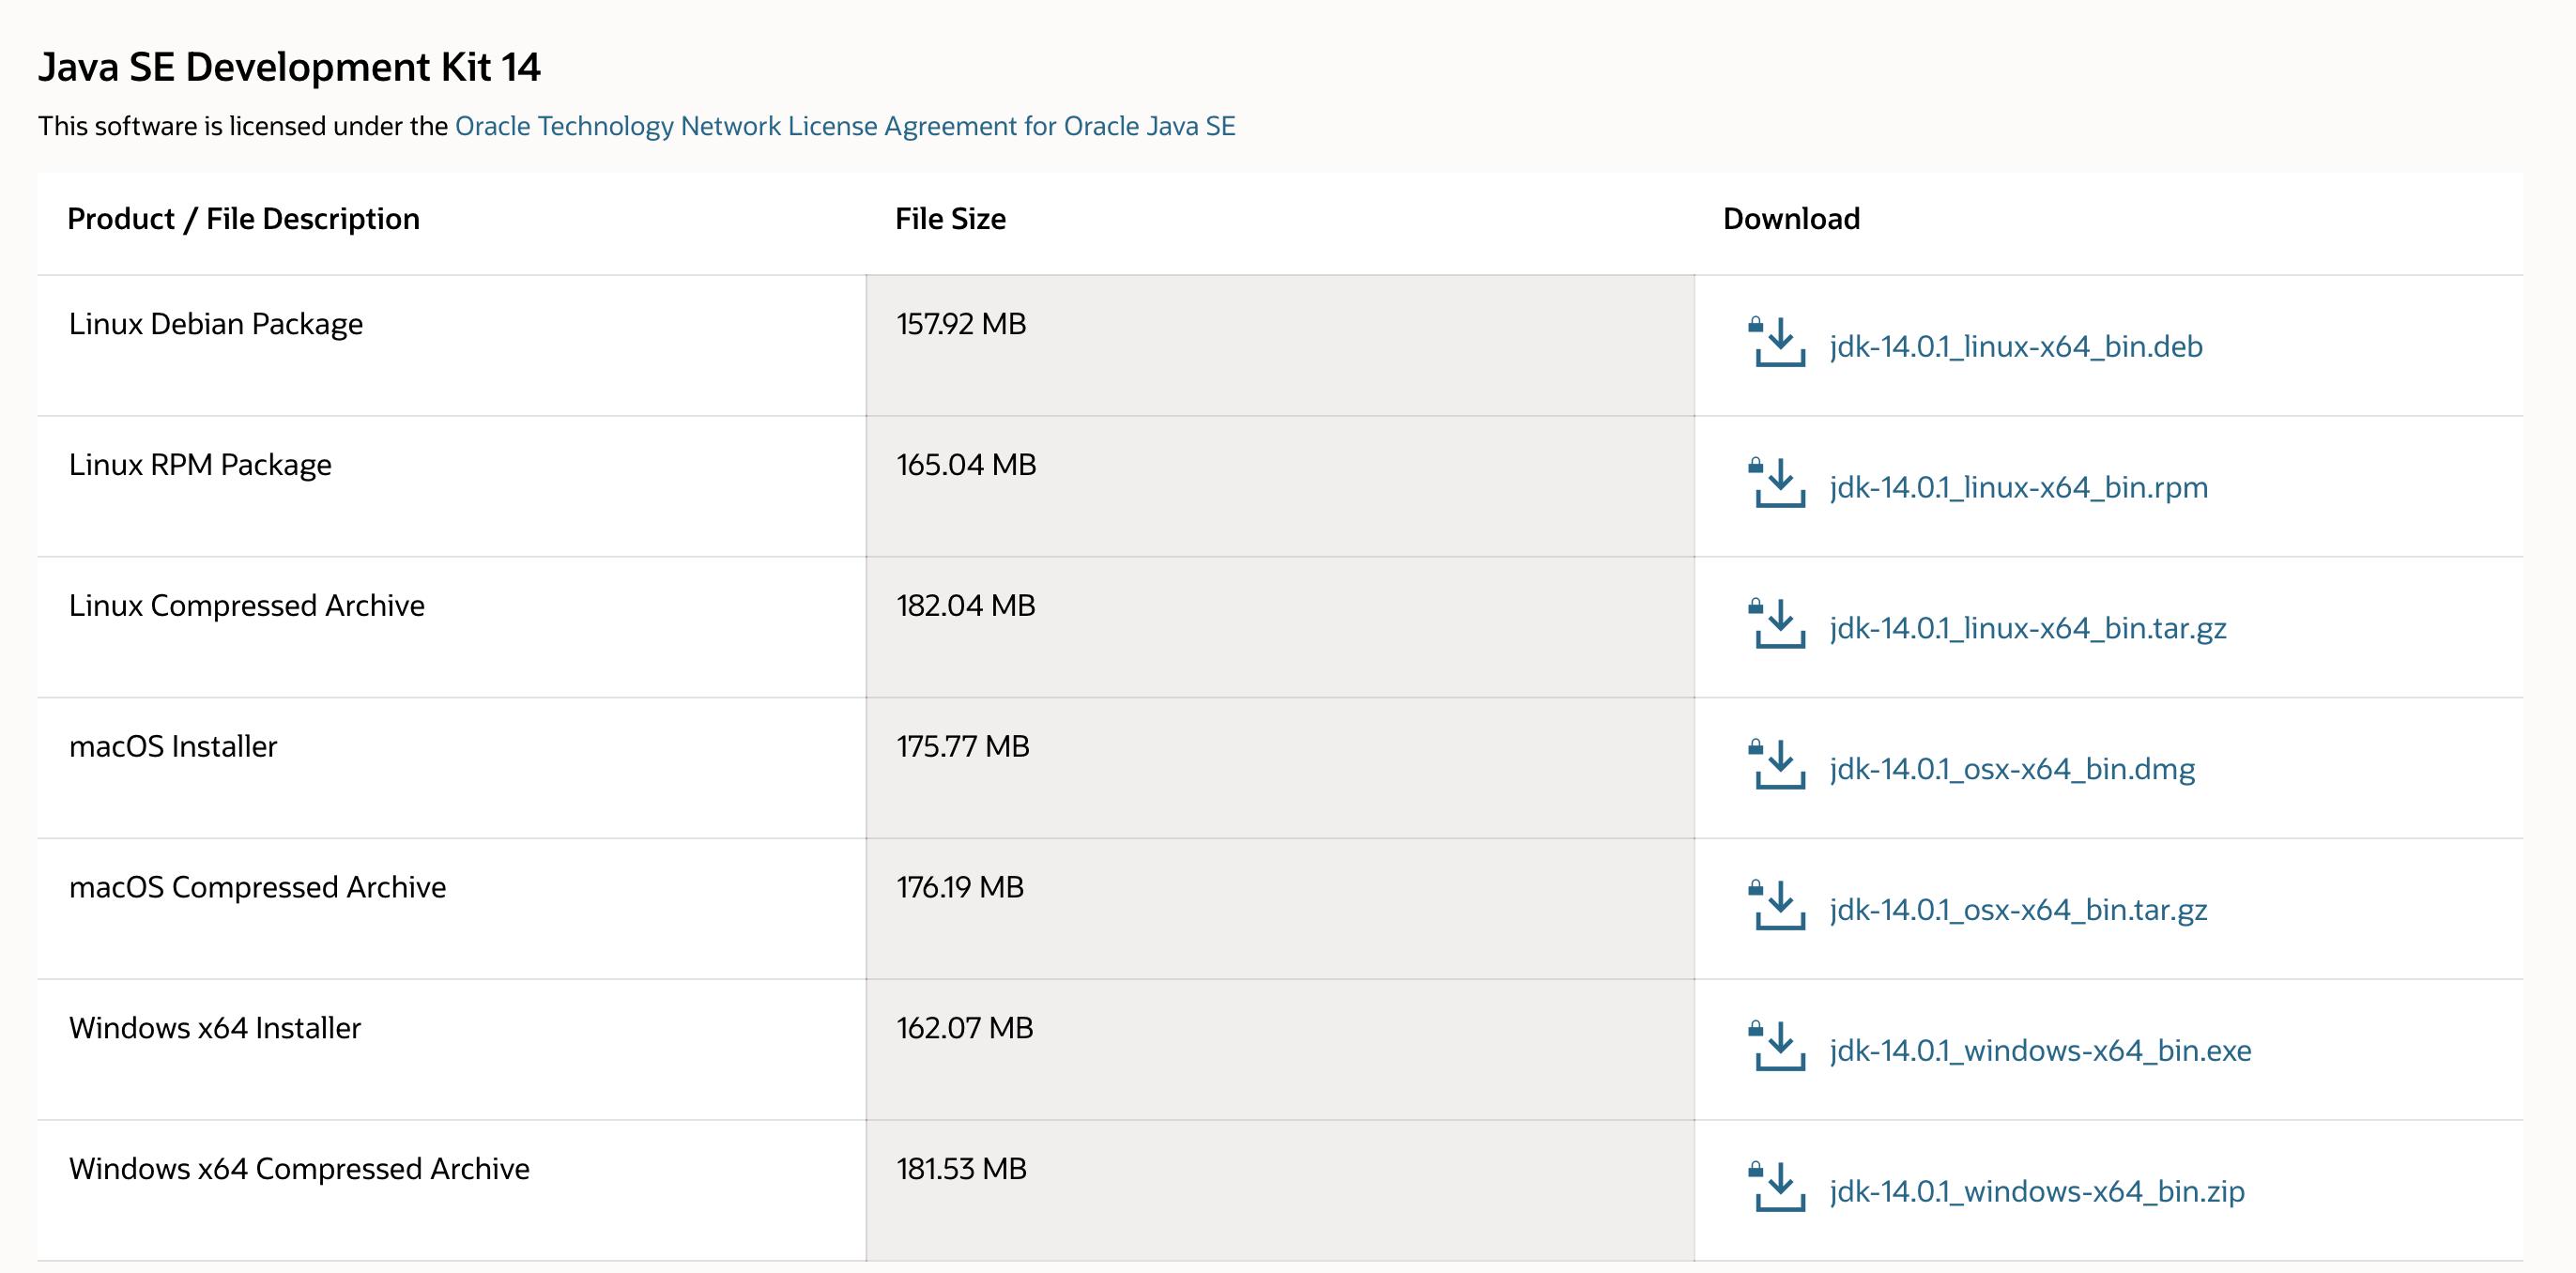 Screenshot 2020-06-02 22.10.10.png